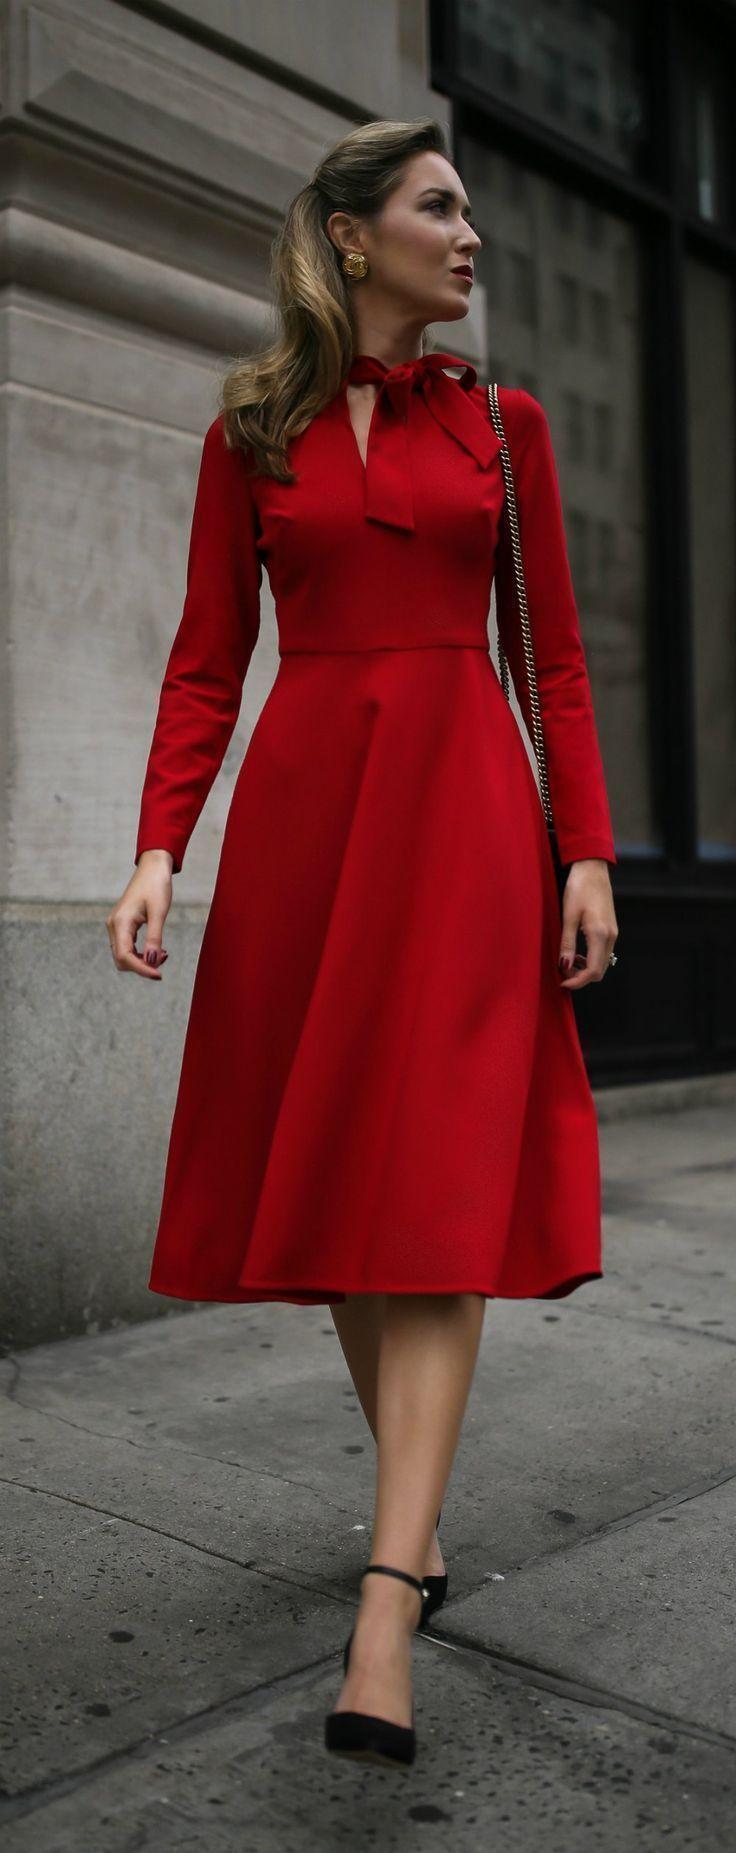 2d20992de23 Business Conference // Red long sleeve fit-and-flare tie-neck midi dress,  black ankle-strap pumps, black leather crossbody bag {Black Halo, Sam  Edelman, ...